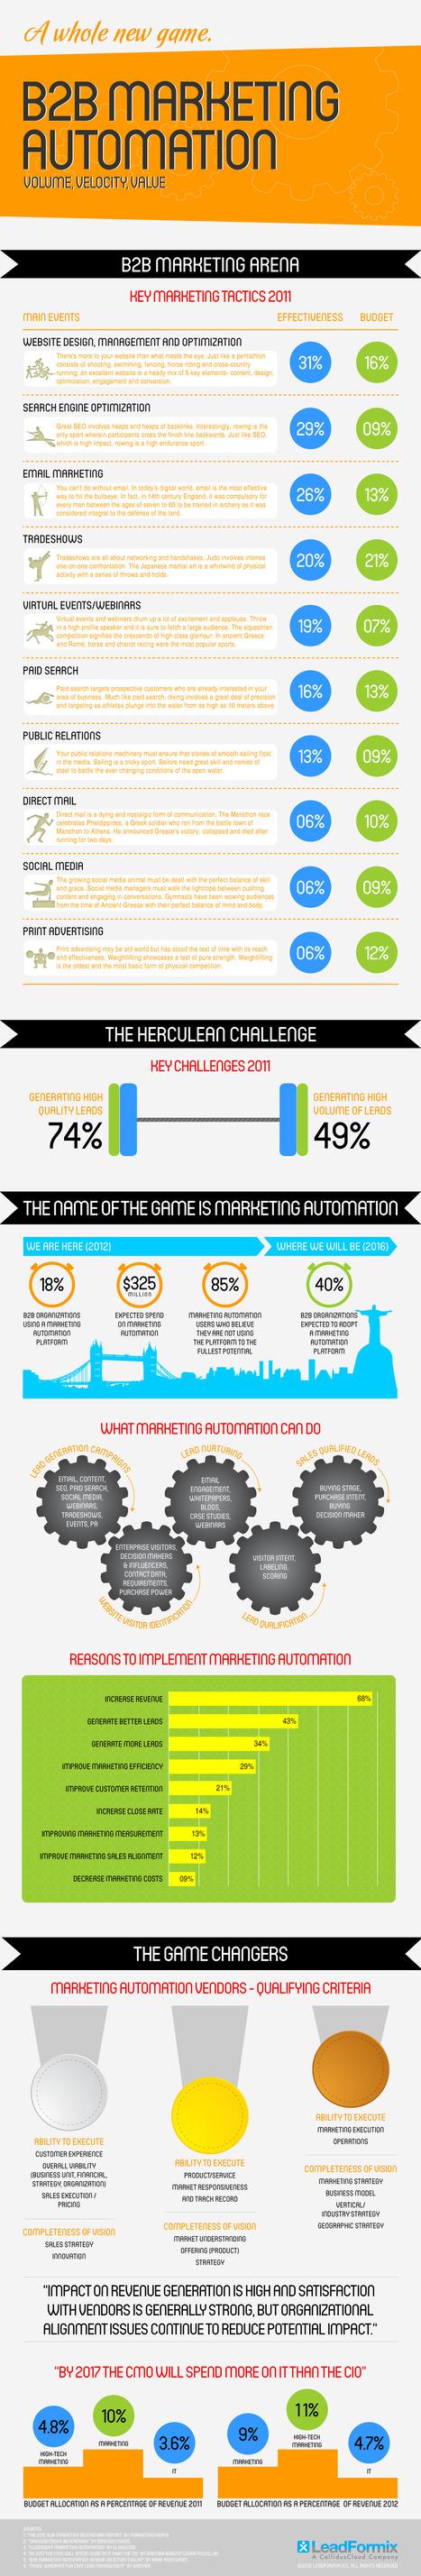 B2B Marketing Automation [INFOGRAPHIC] | B2B Marketing Automation Infographics | Scoop.it